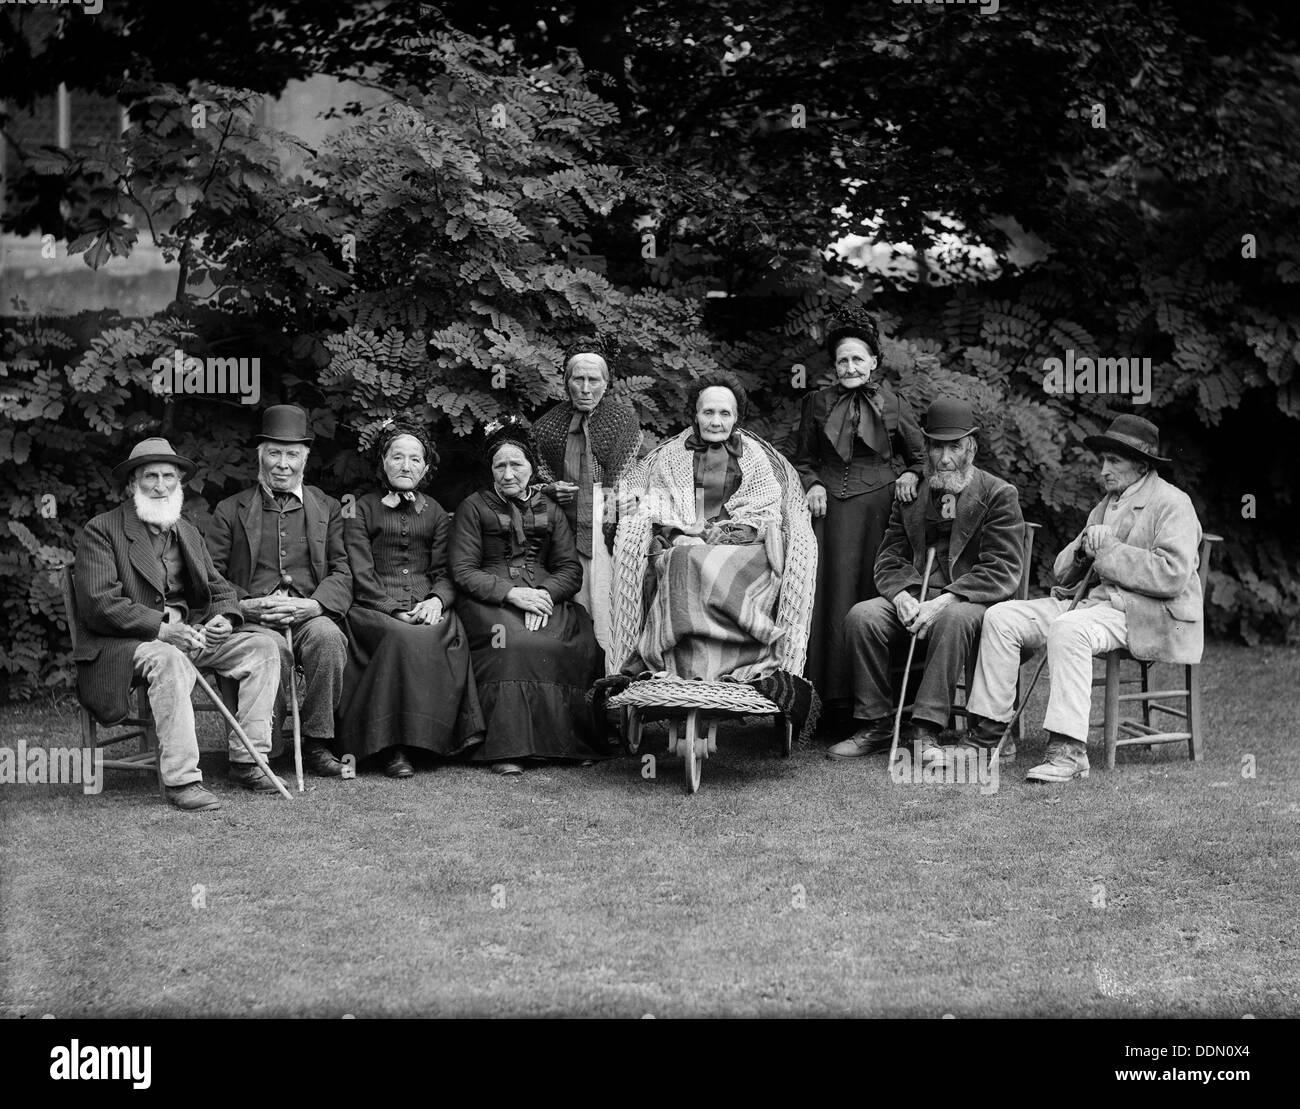 Group portrait at West Ilsley, Berkshire, c1860-c1922. Artist: Henry Taunt Stock Photo